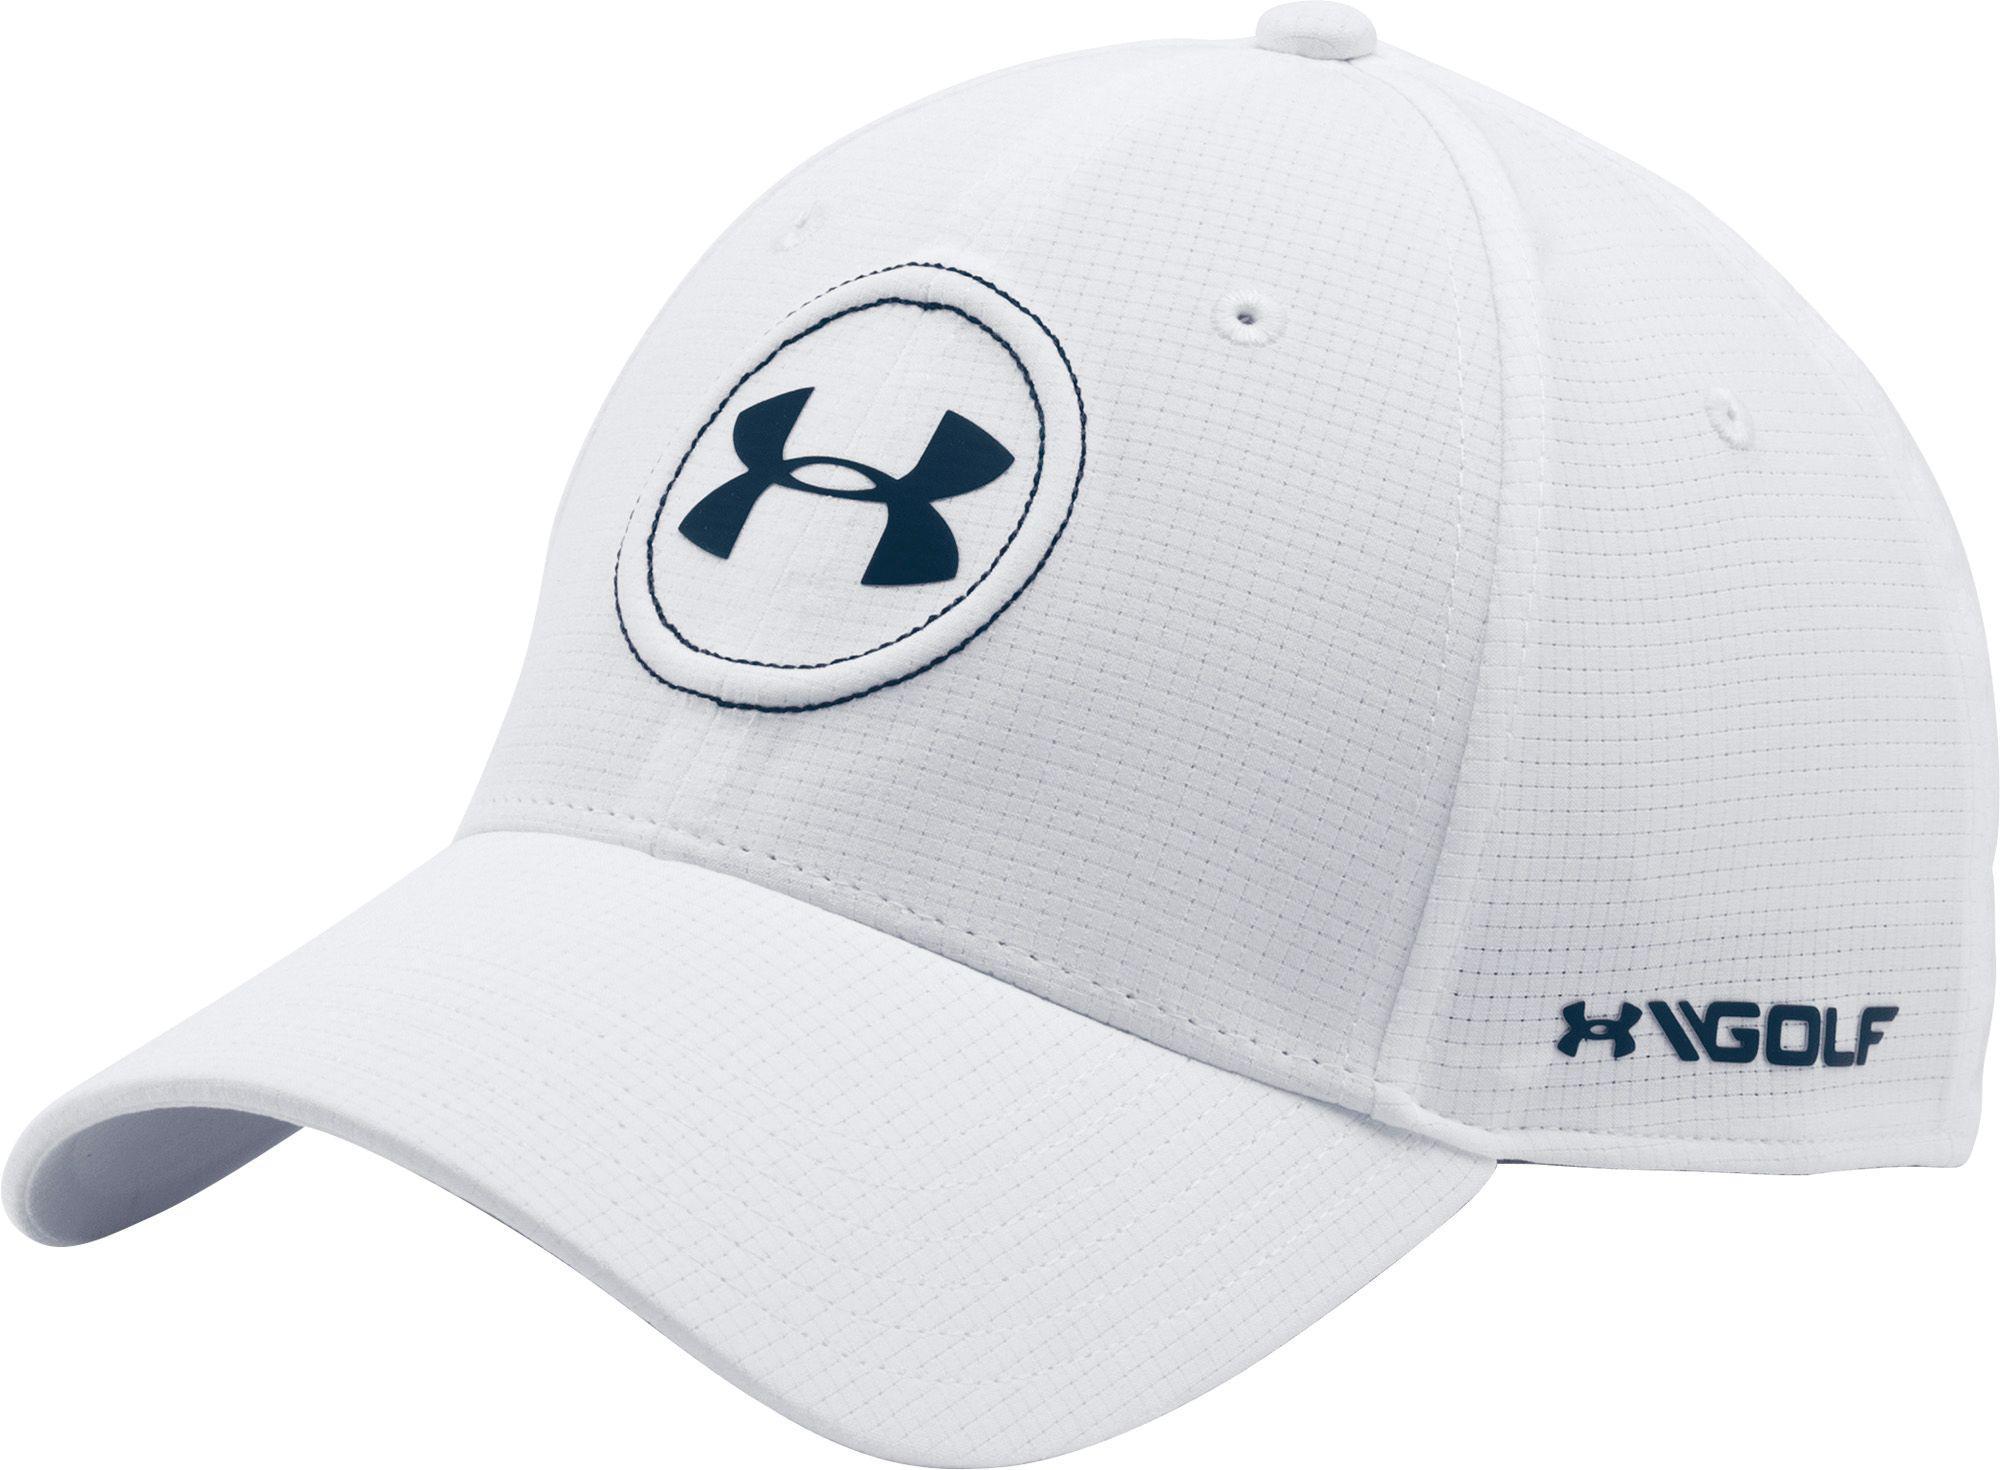 65190504bfdd27 Under Armour - White Jordan Spieth Official Tour Golf Hat for Men - Lyst